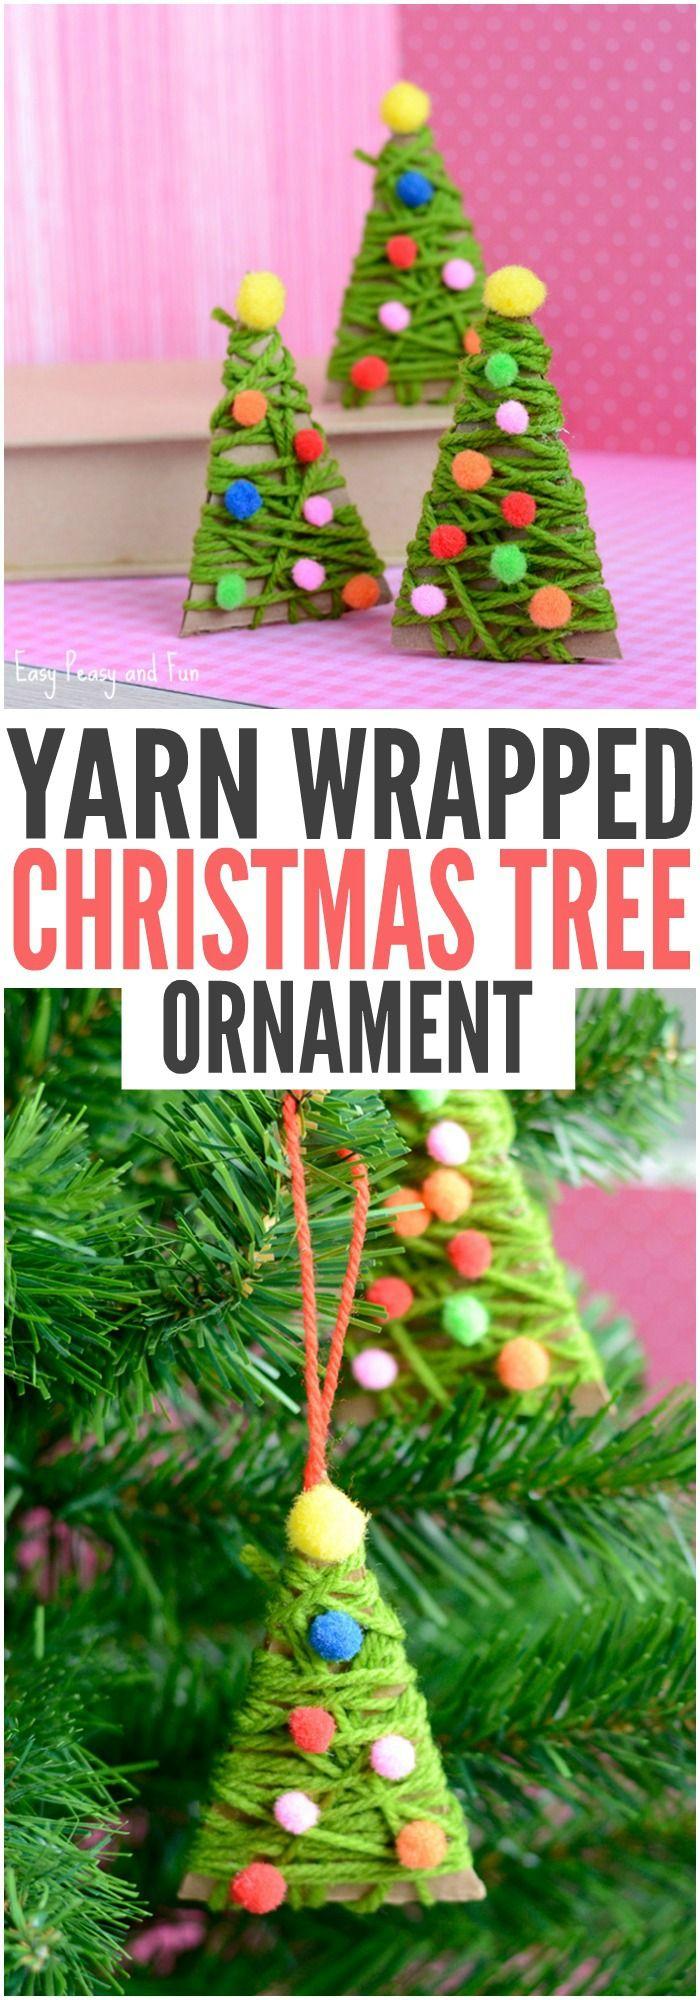 Yarn Wrapped Christmas Tree Ornaments | Christmas ornament ...